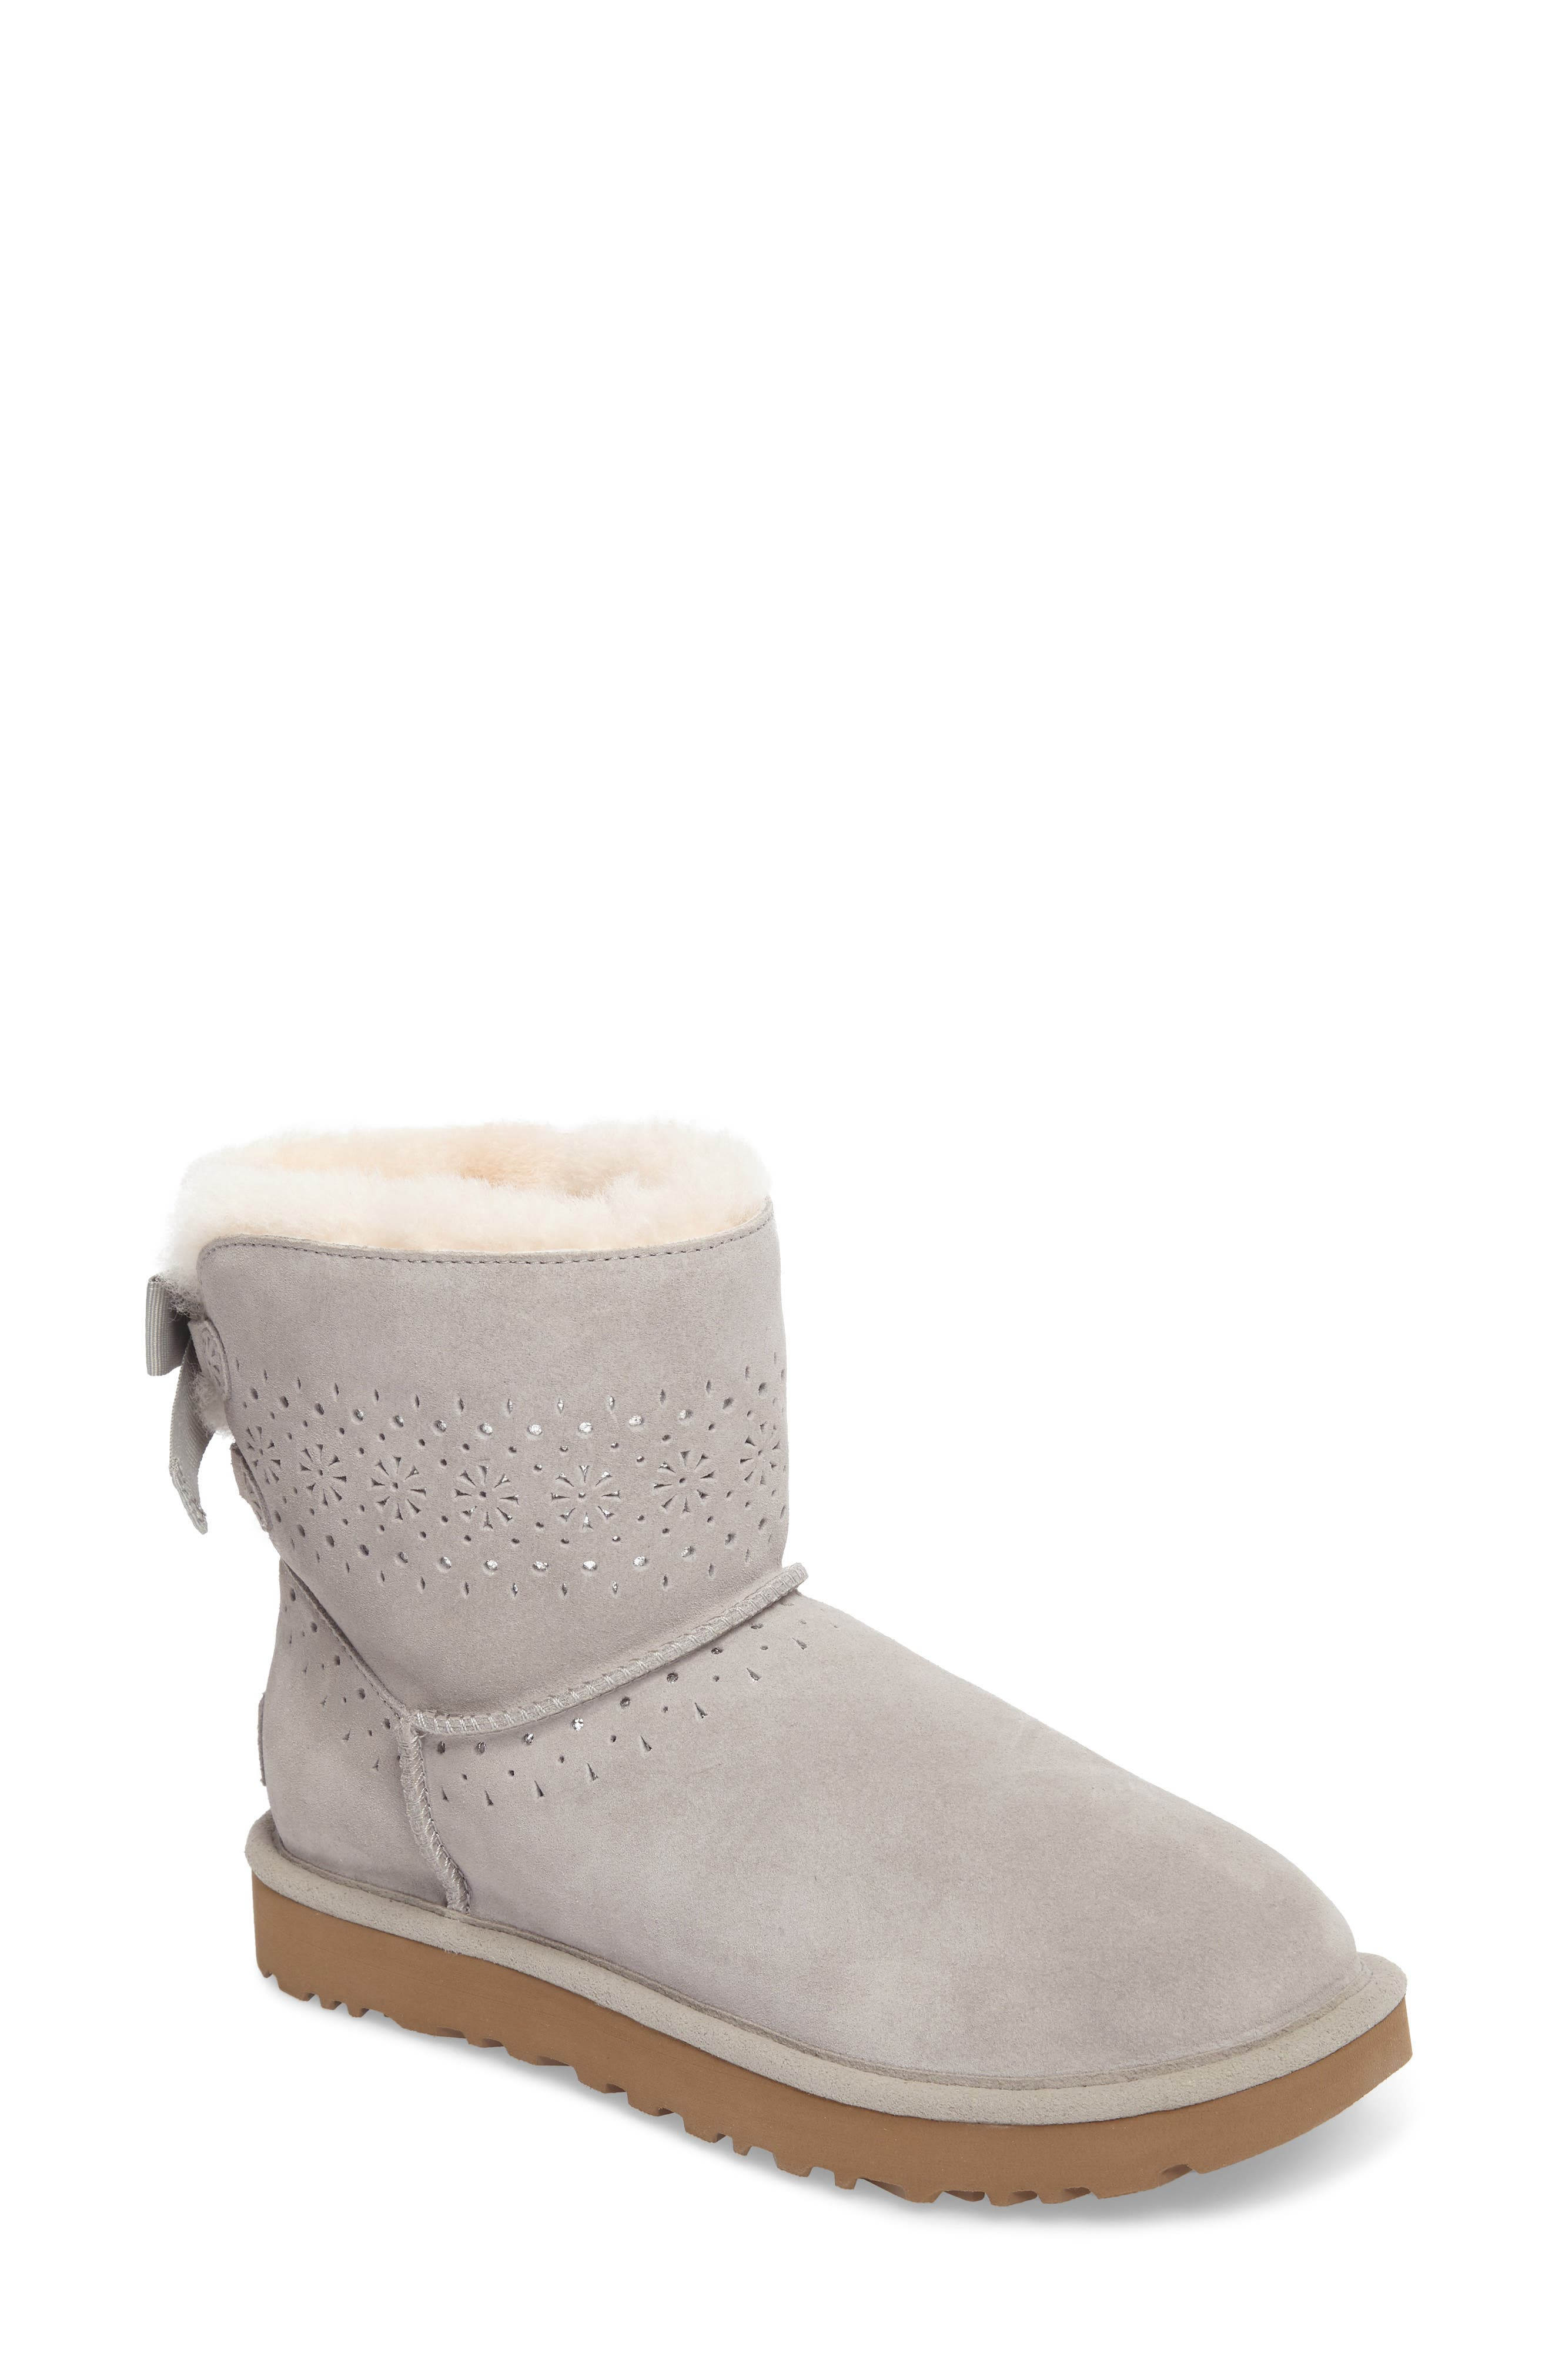 Main Image - UGG® Dae Sunshine Boot (Women)